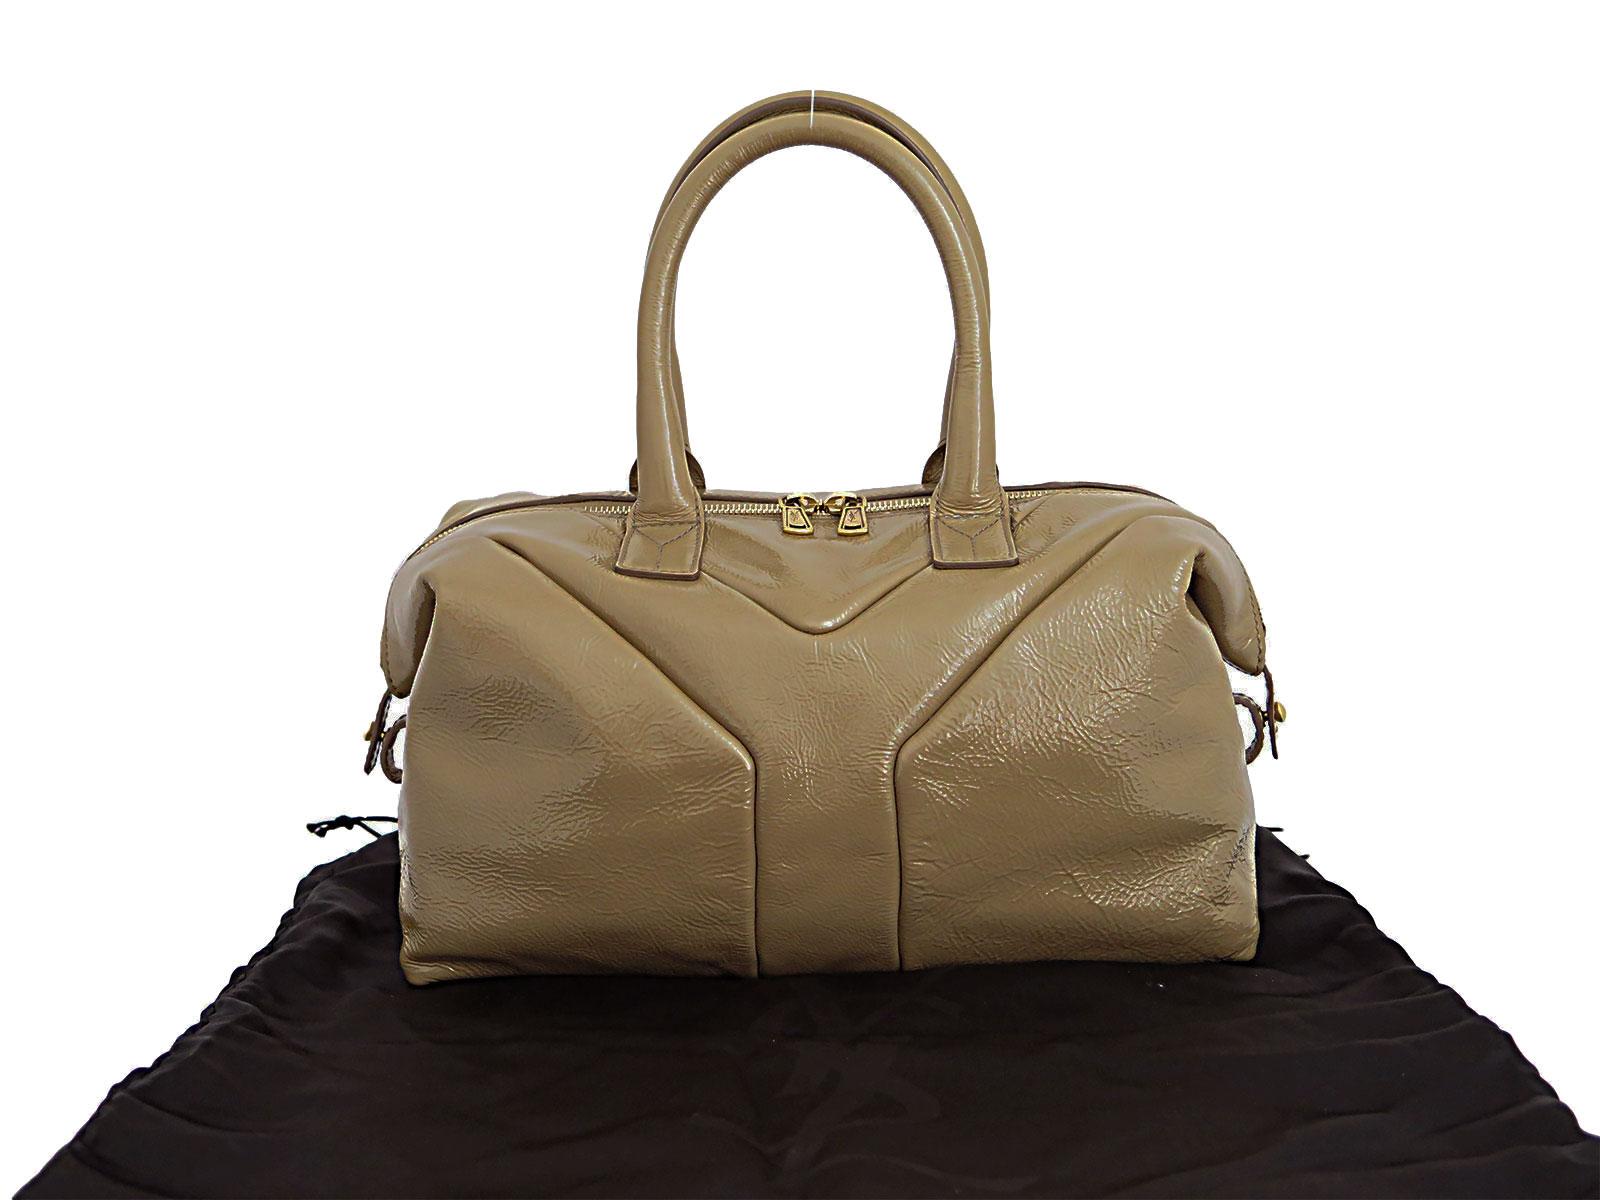 5a829c92079ef Yves St Laurent Handbag Ebay